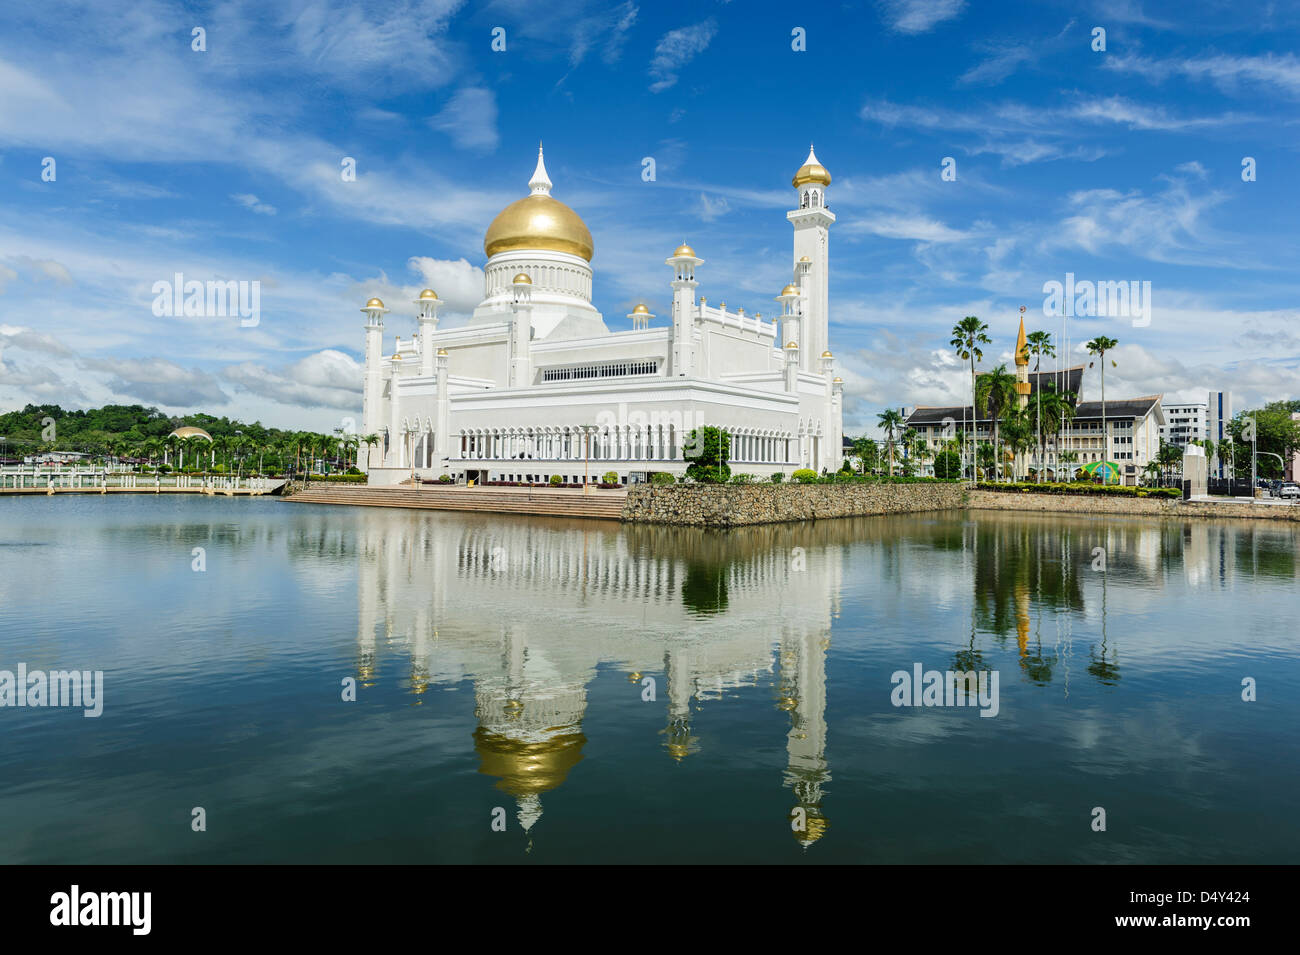 View of Omar Ali Saifuddien Mosque, Bandar Seri Bengawan, Brunei, Borneo, Asia. - Stock Image